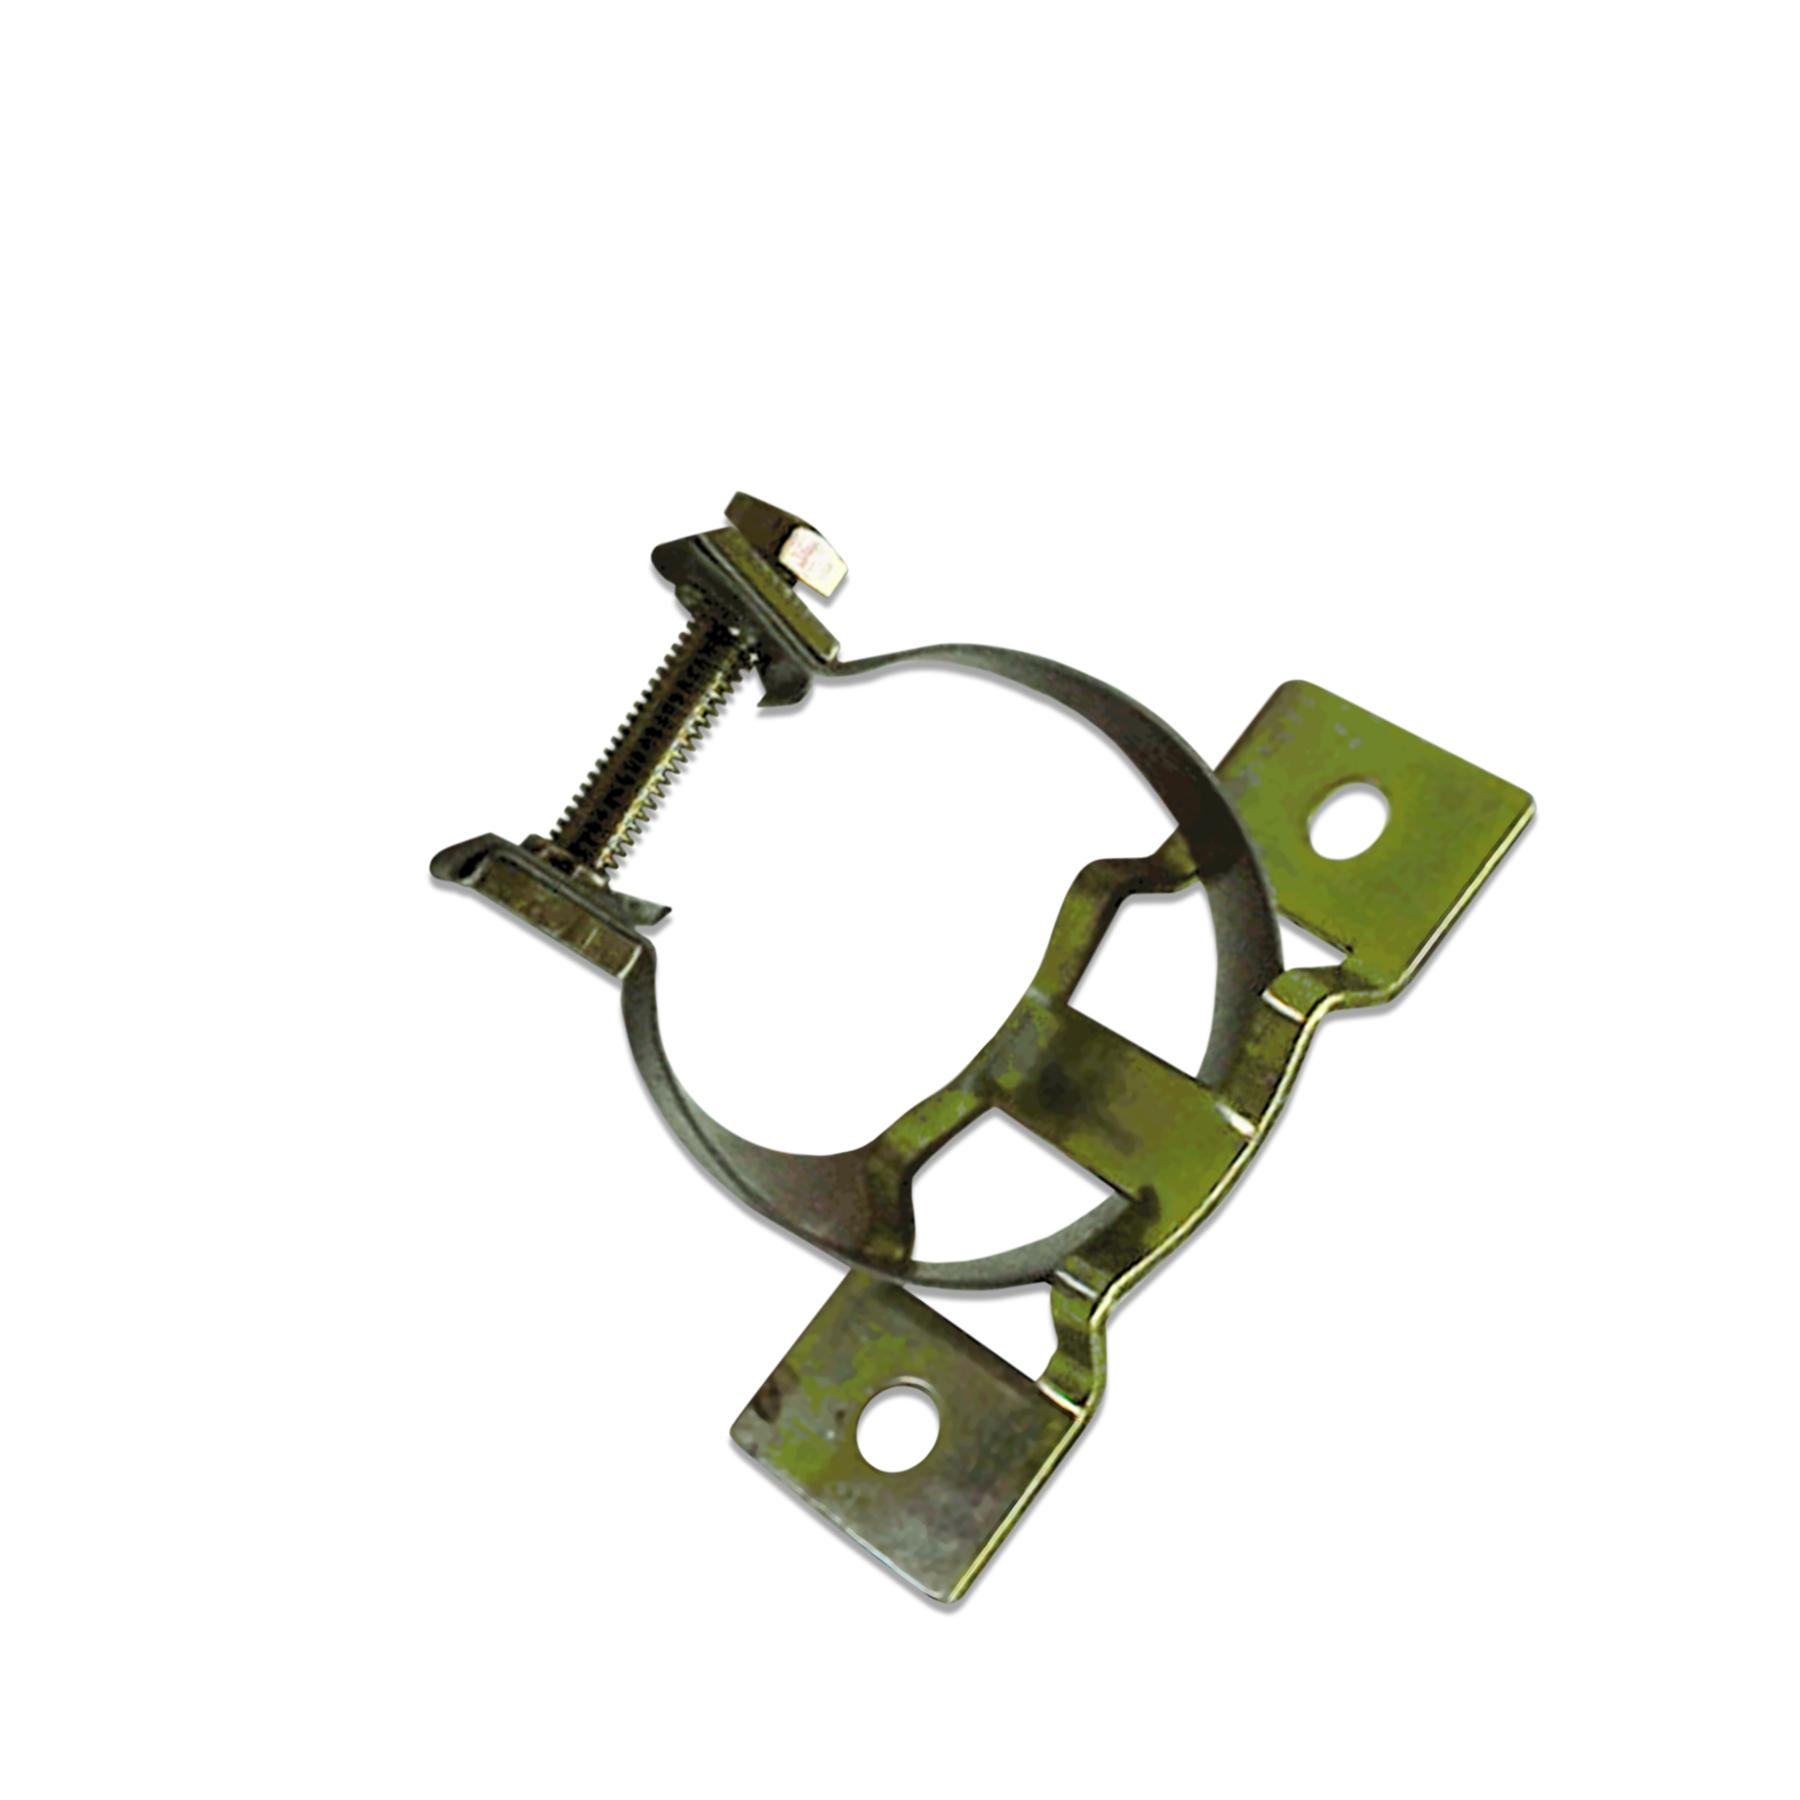 Inline Fuel Filter Mounting Bracket